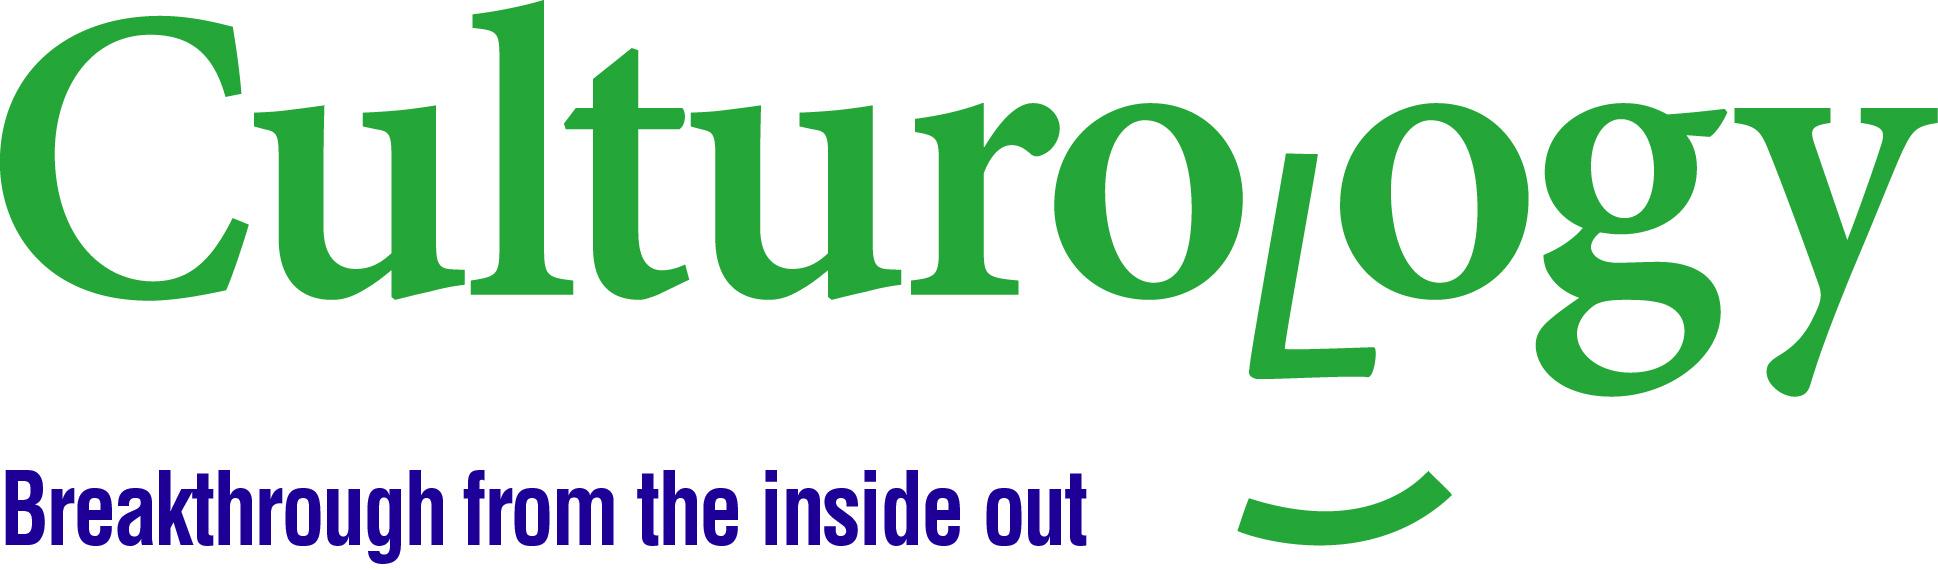 Culturology logo